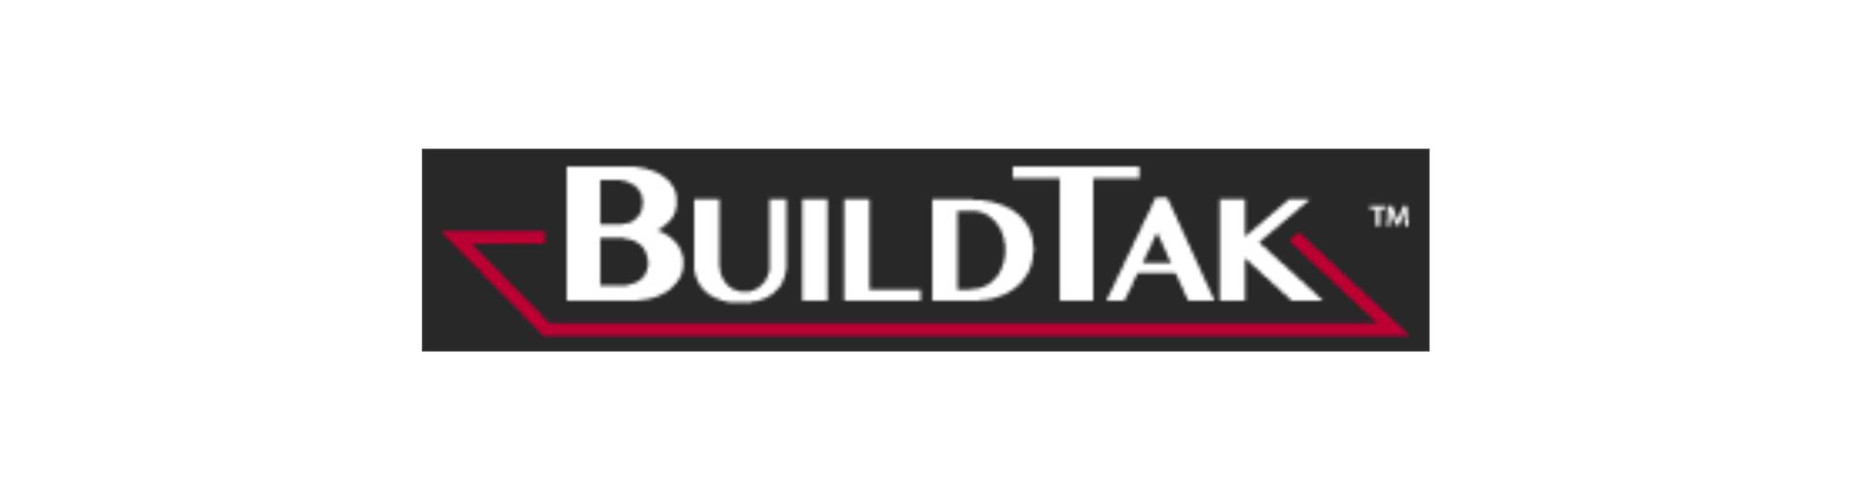 Buildtak.jpg